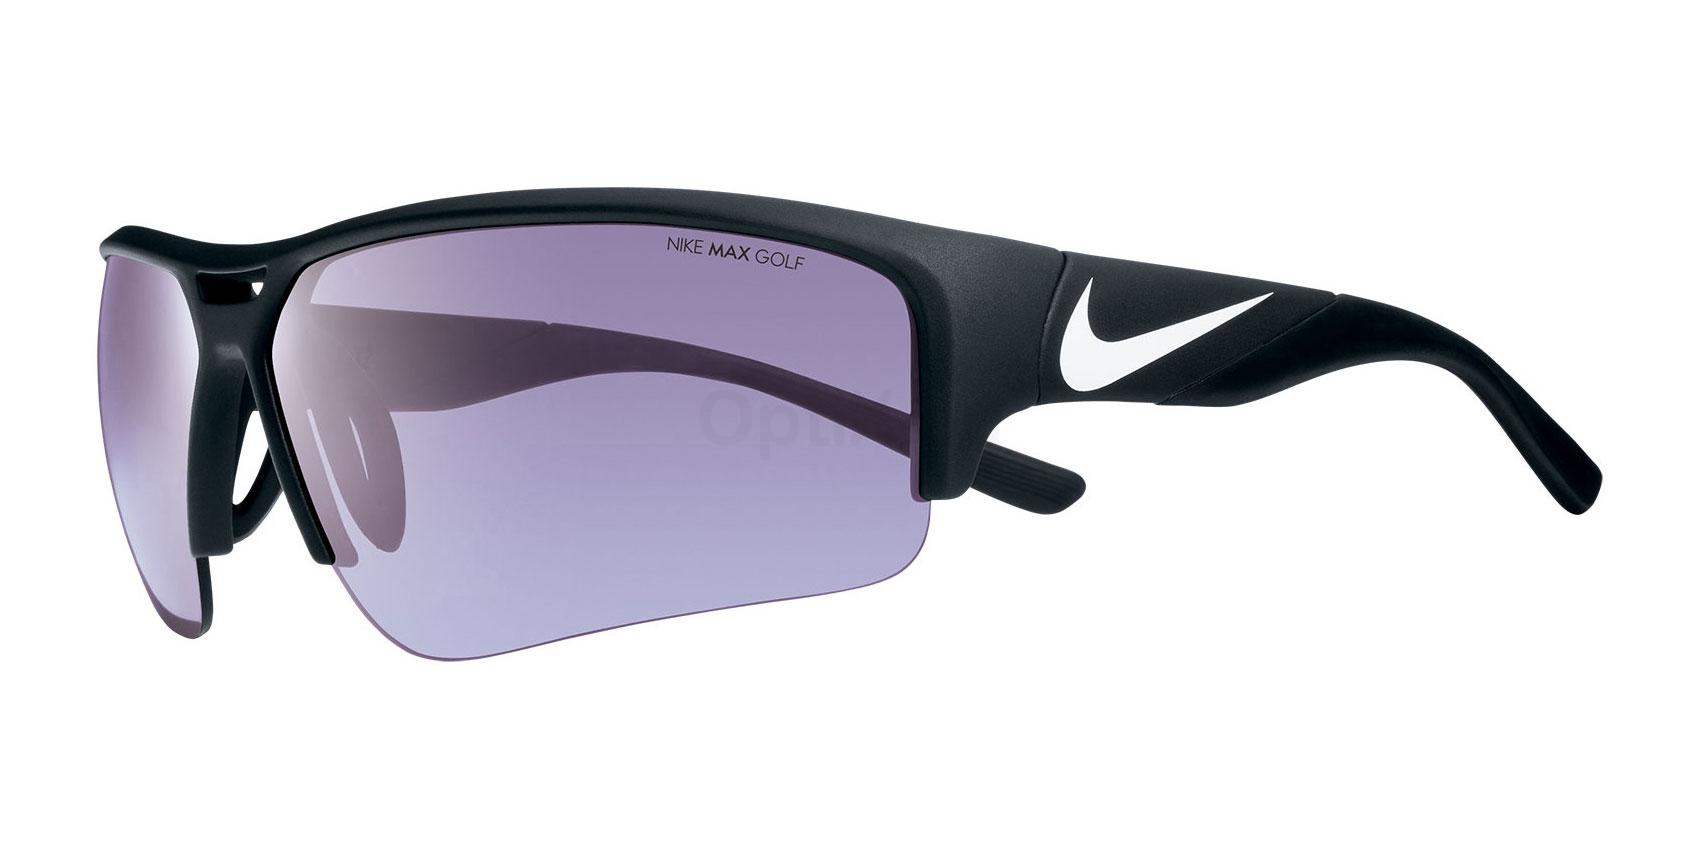 010 NIKE GOLF X2 PRO E EV0873 , Nike